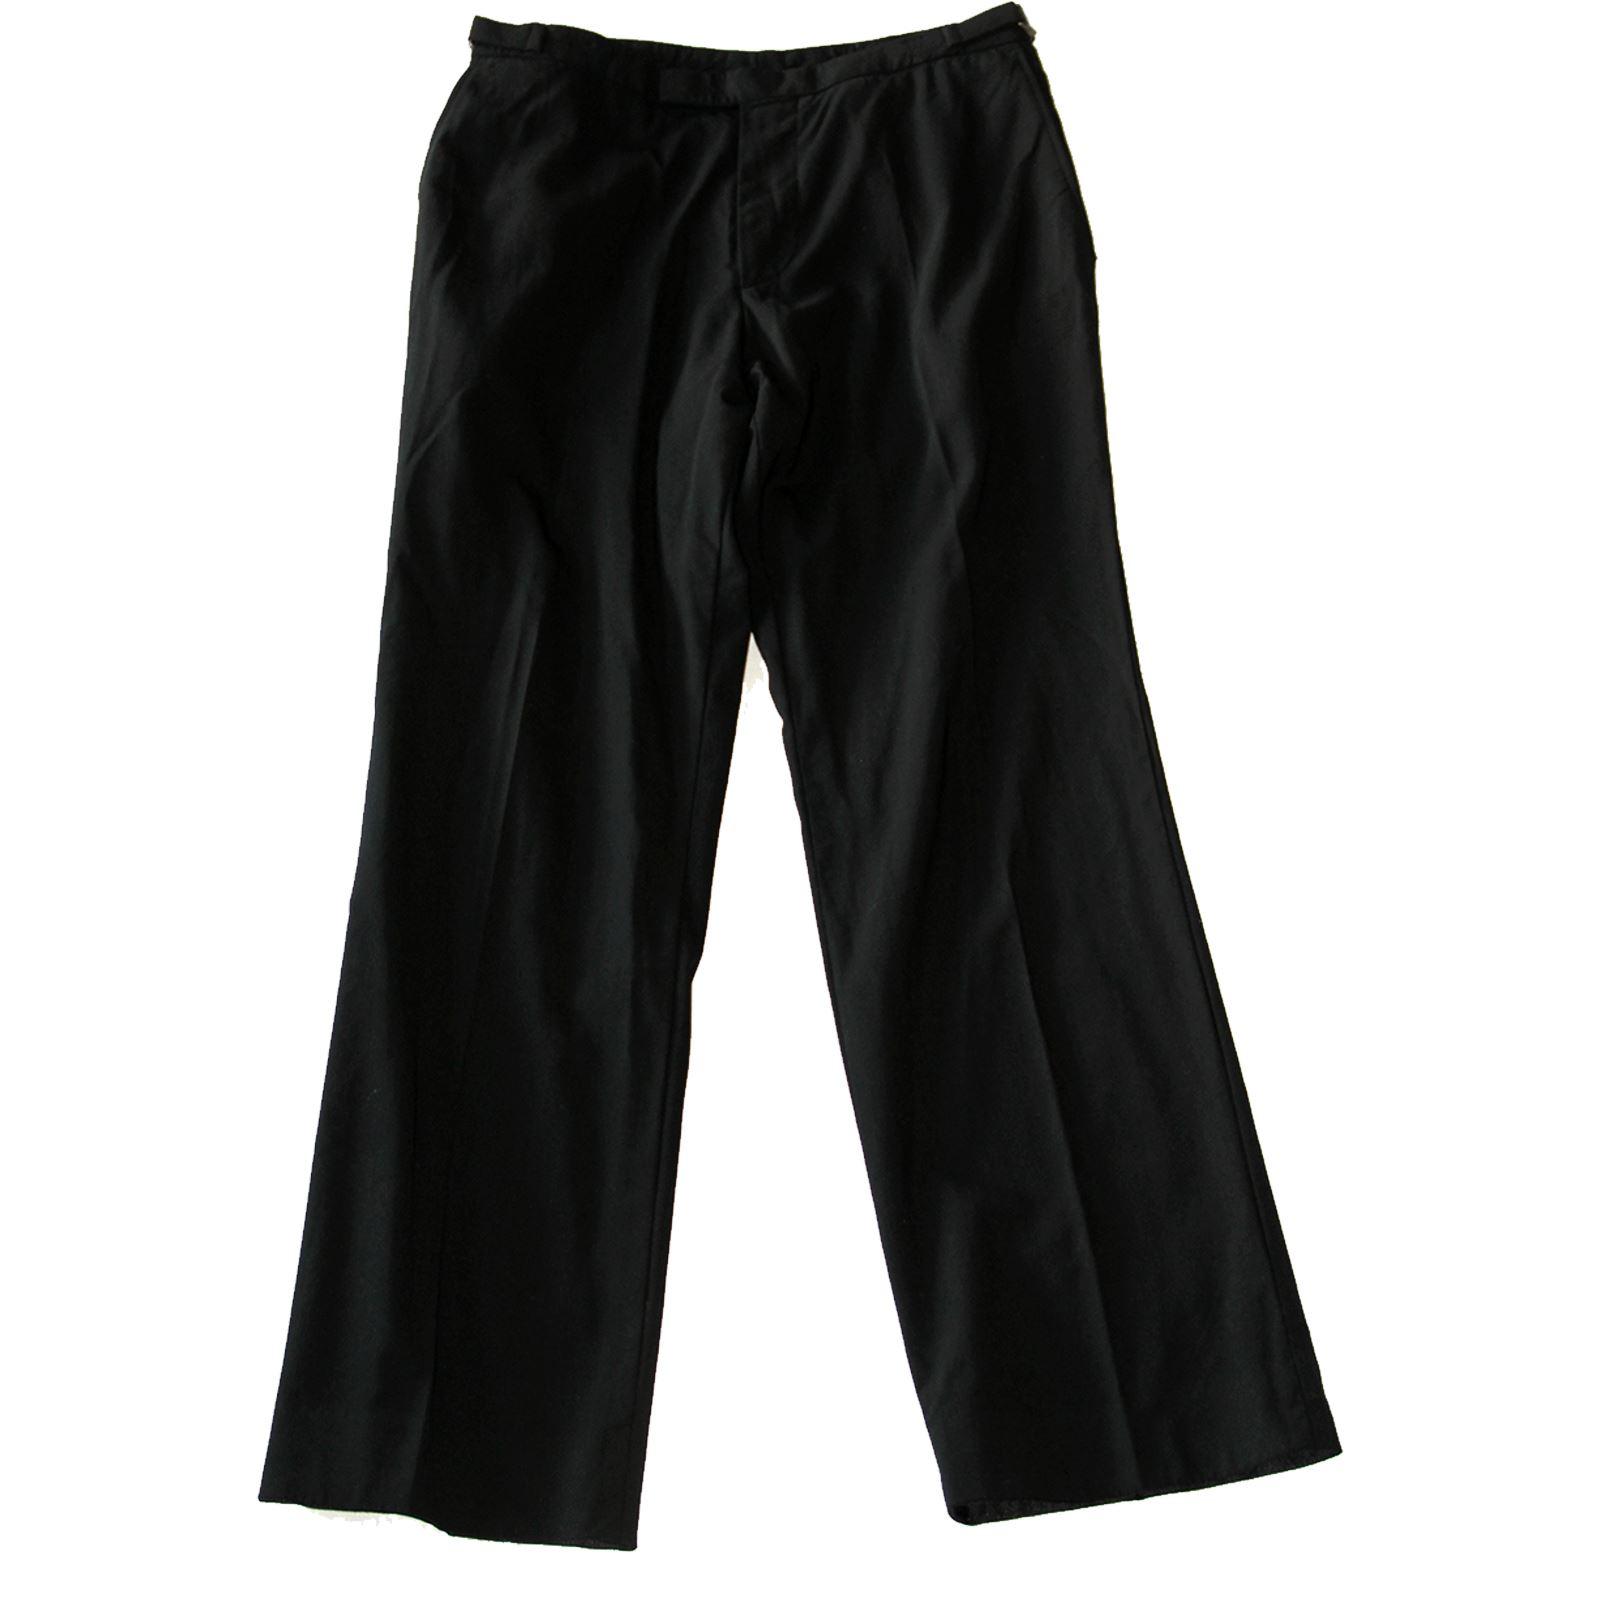 2cb3834fb57 NEW WOMEN S HUGO BOSS BLACK CASUAL QUALITY TROUSERS REGULAR LEG W31 31 RRP  £103